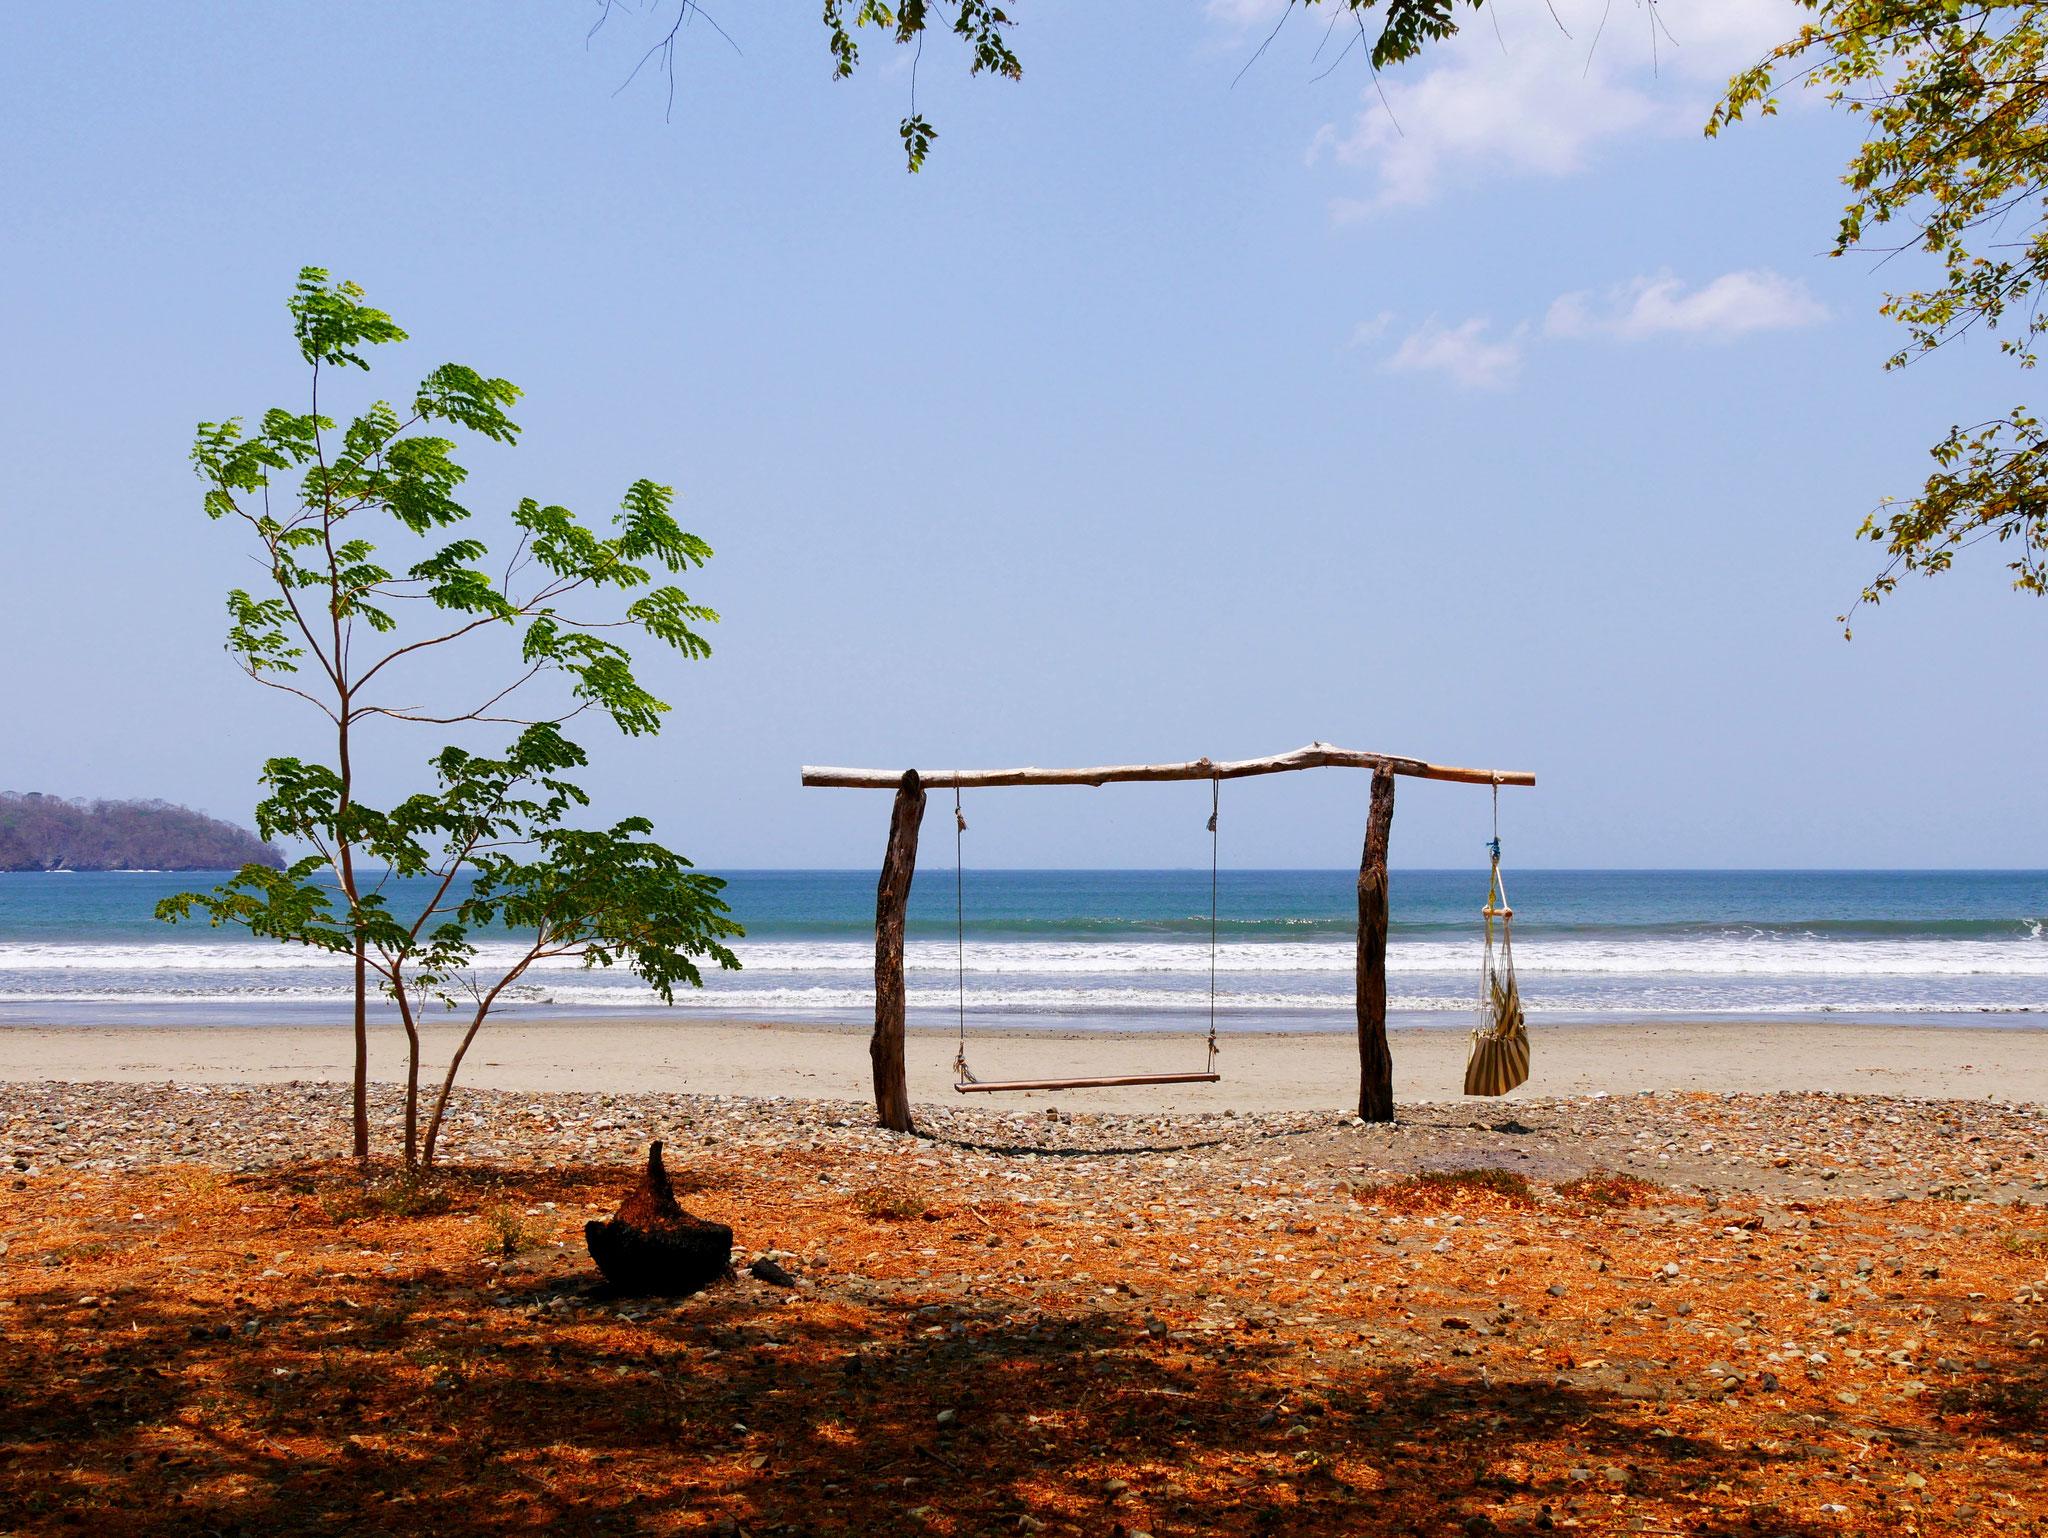 Camping in Playa Venao